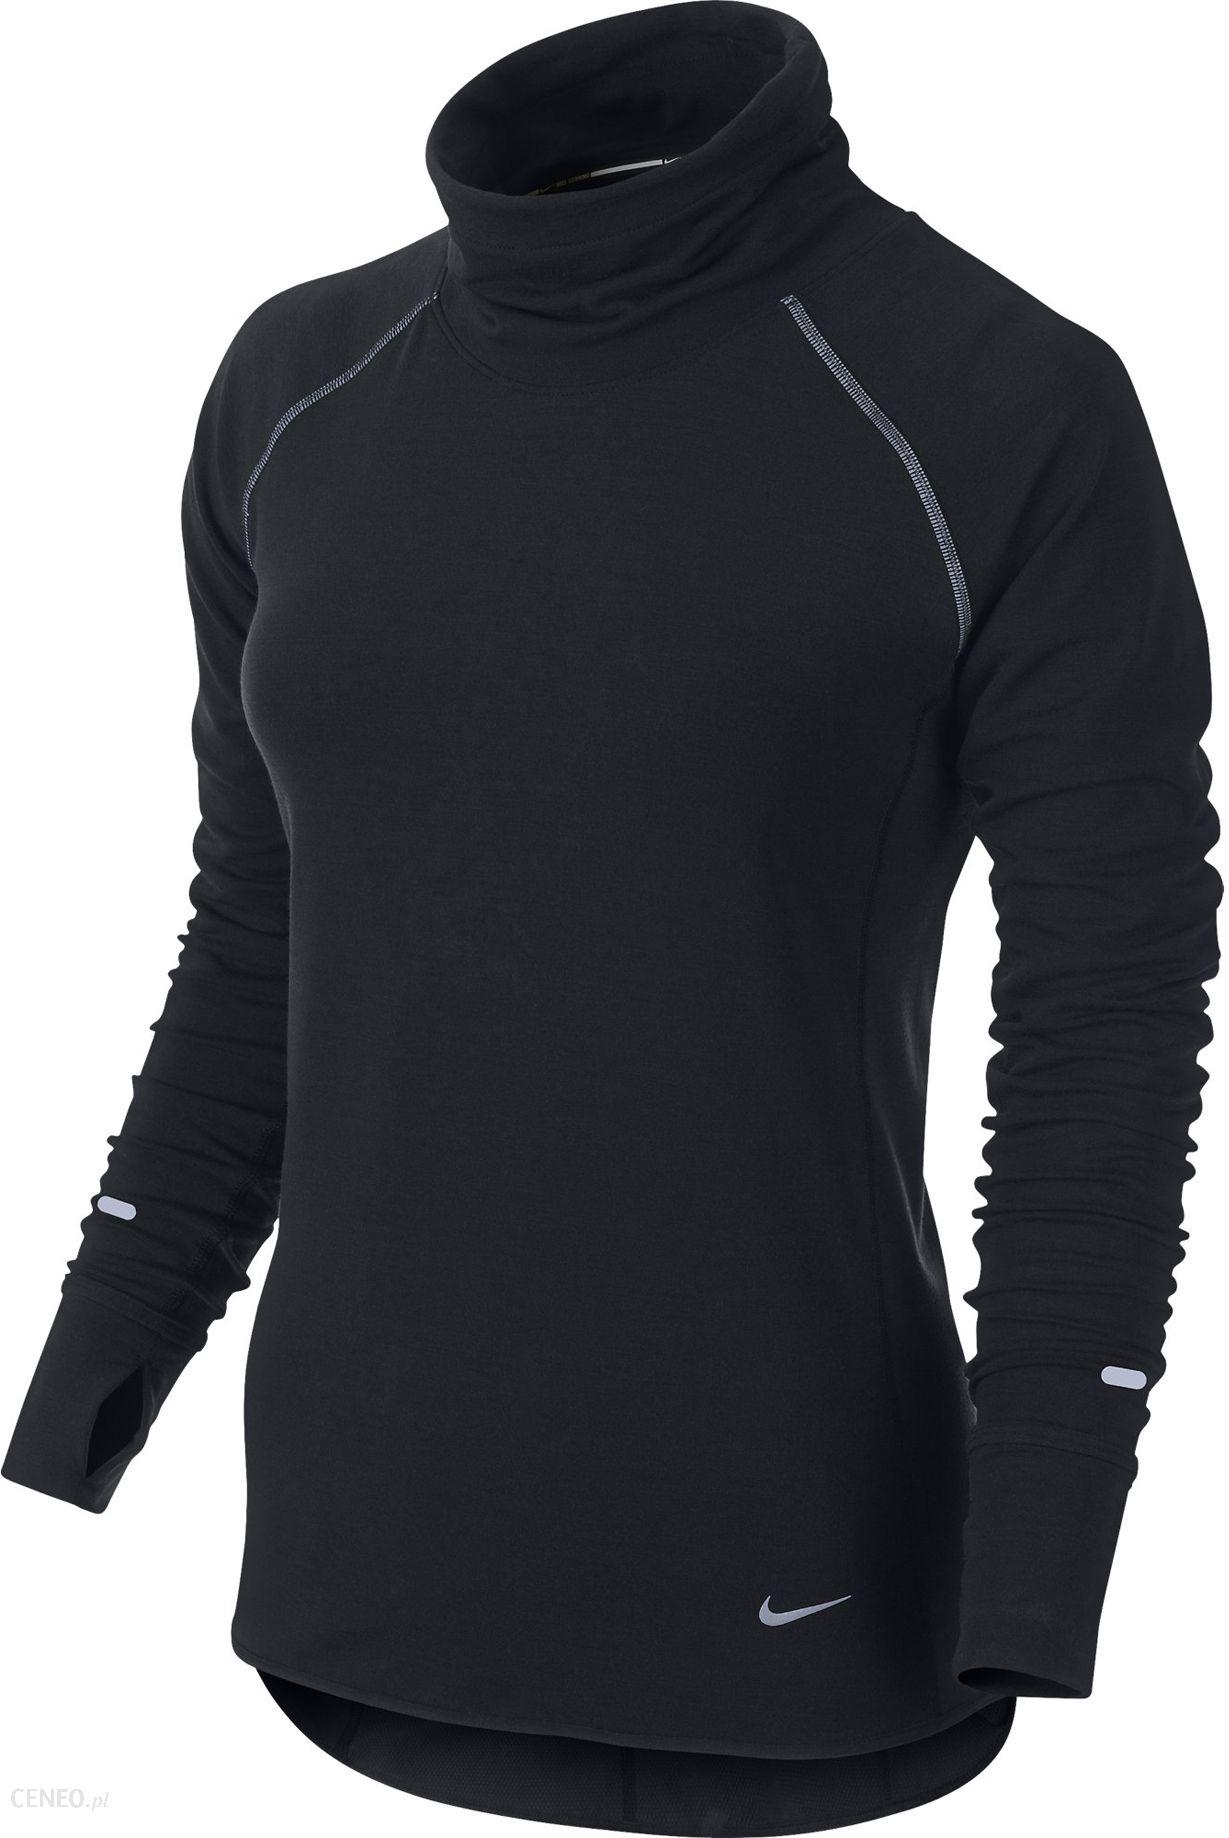 Bluza Nike Dri Fit Sprint Fleece Pullover 627001 010 Ceny i opinie Ceneo.pl